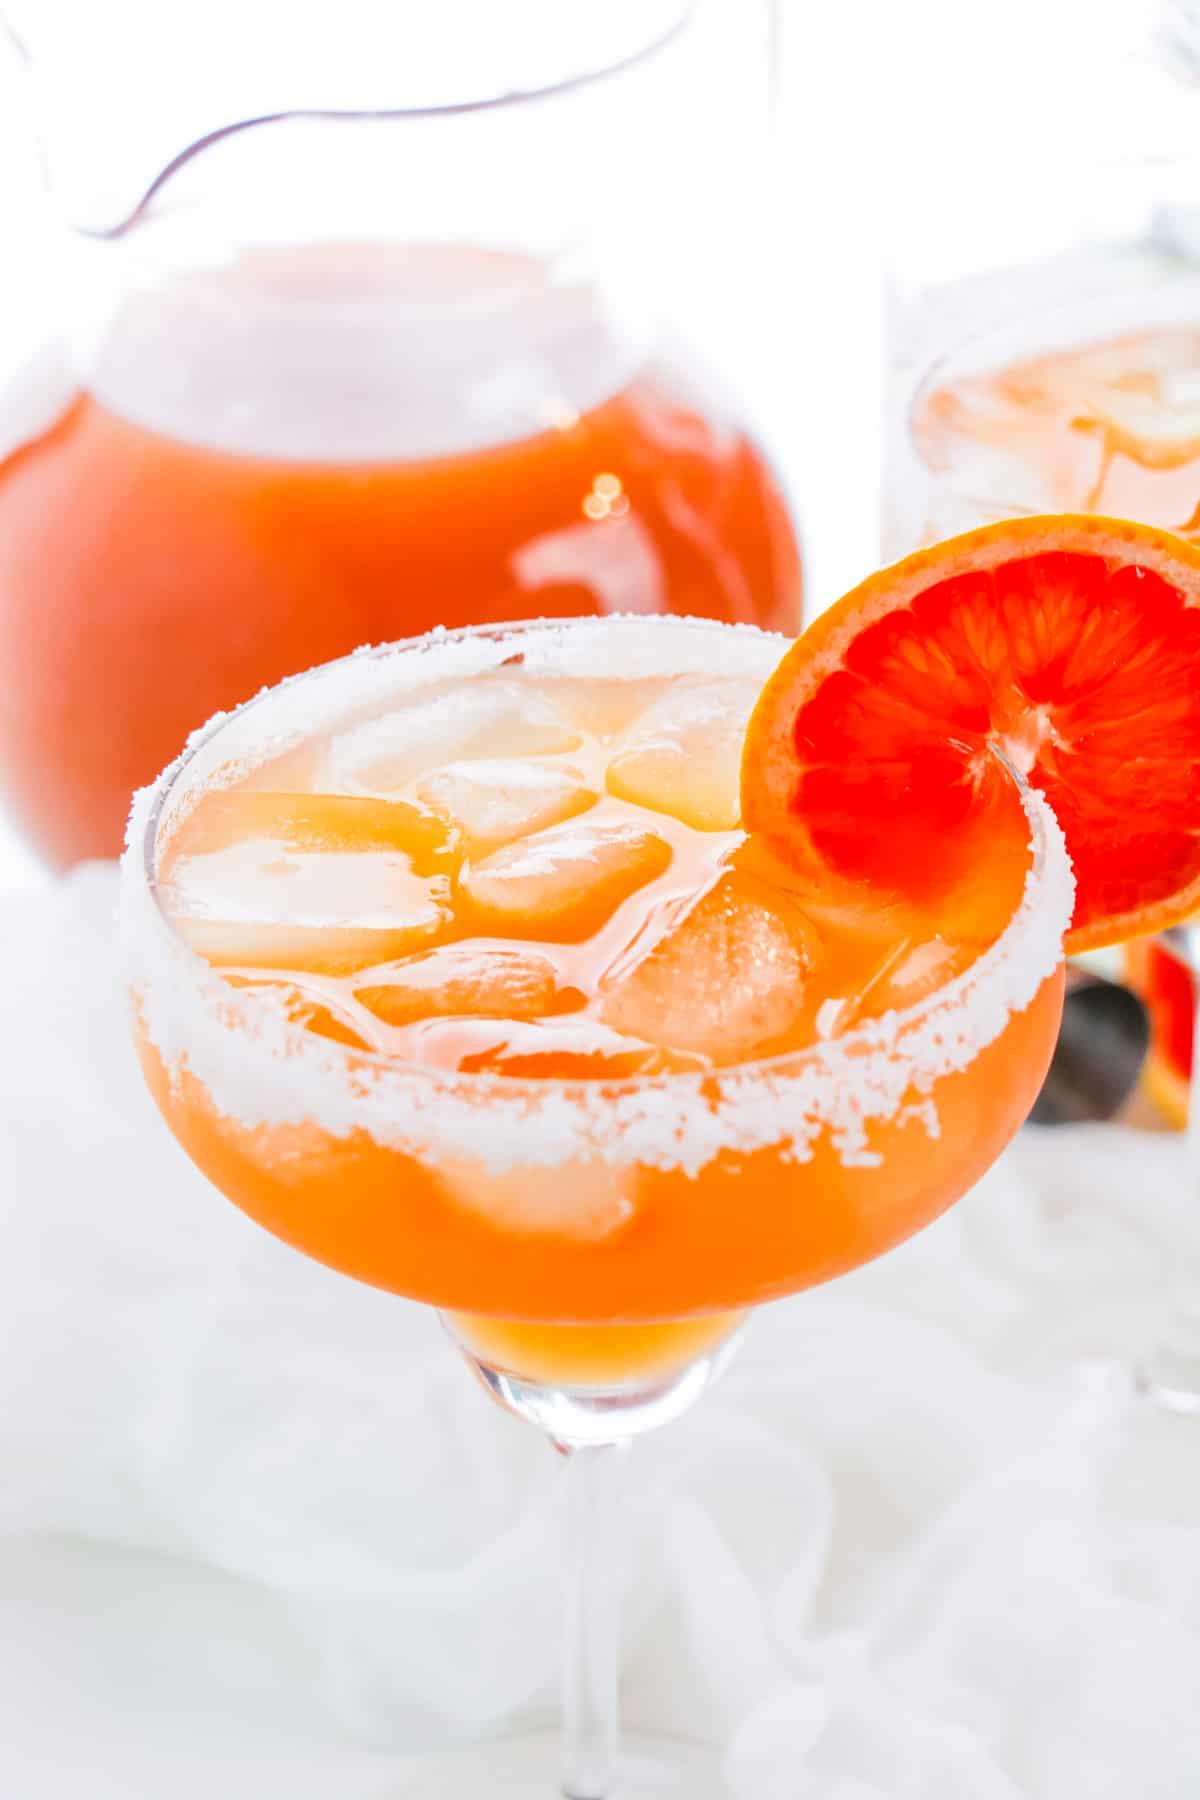 Grapefruit margarita over ice in margarita glass garnished with fresh grapefruit slice. Pitcher of grapefruit juice in background